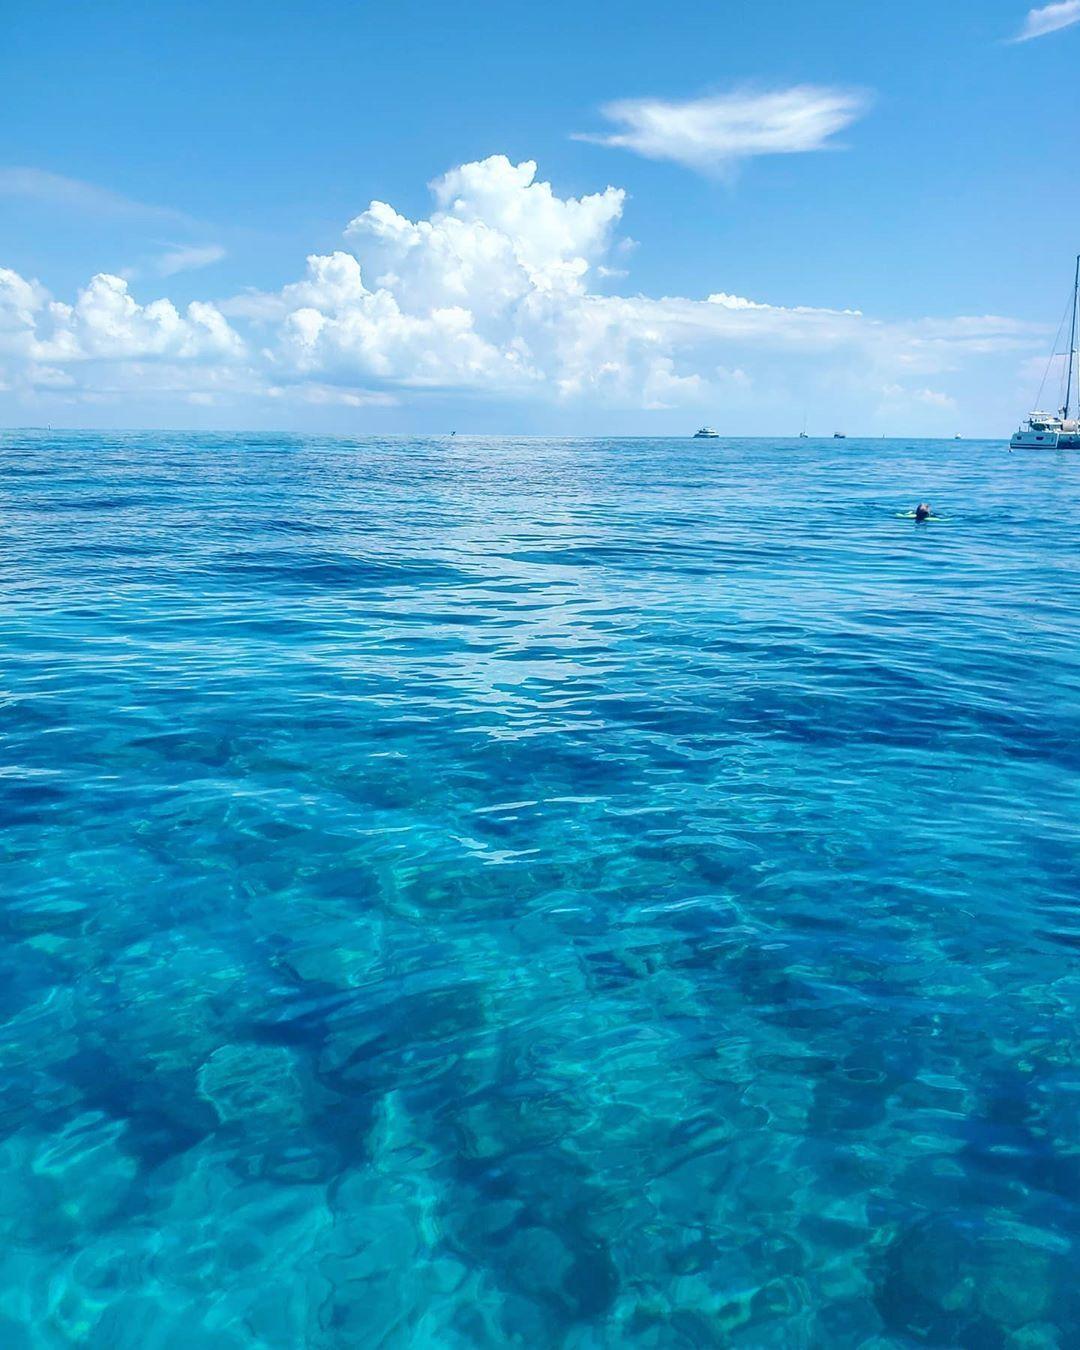 "key West Locals on Instagram: ""Fri-yayyyyyyy! Let the weekend begin!! 🌊🥂 . . . #keywest #ocean #pictureperfect #thelocallifekw #floridakeys"""